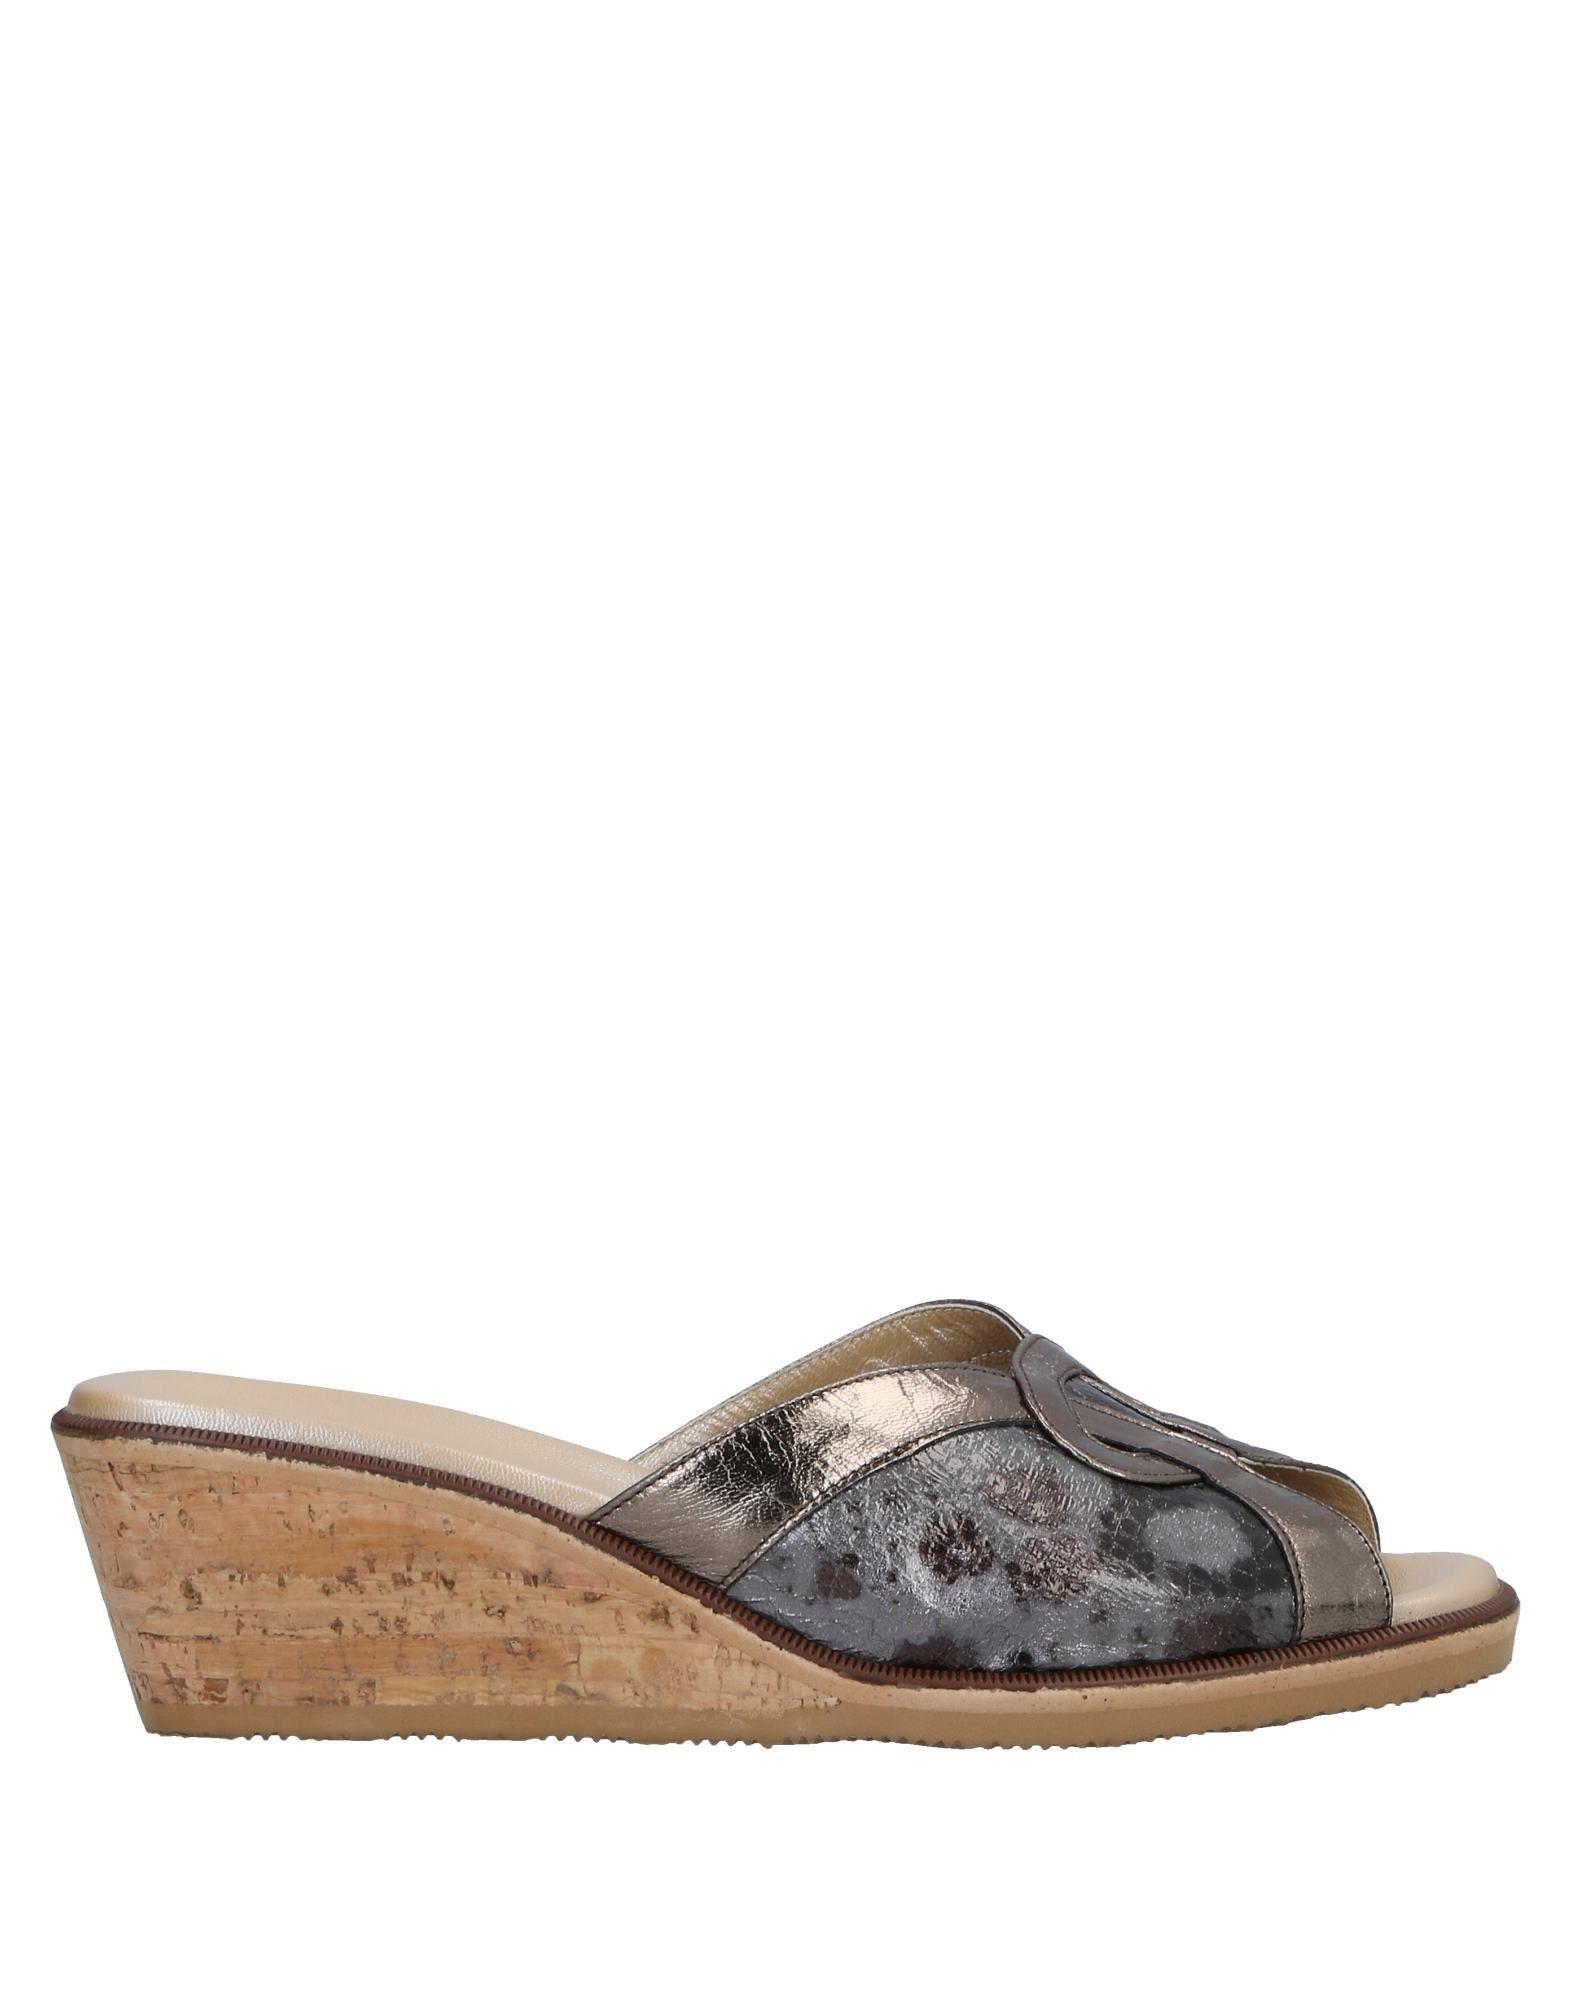 Ice® F.Lli Diomedi Pantoletten Damen  11531829MV Gute Qualität beliebte Schuhe